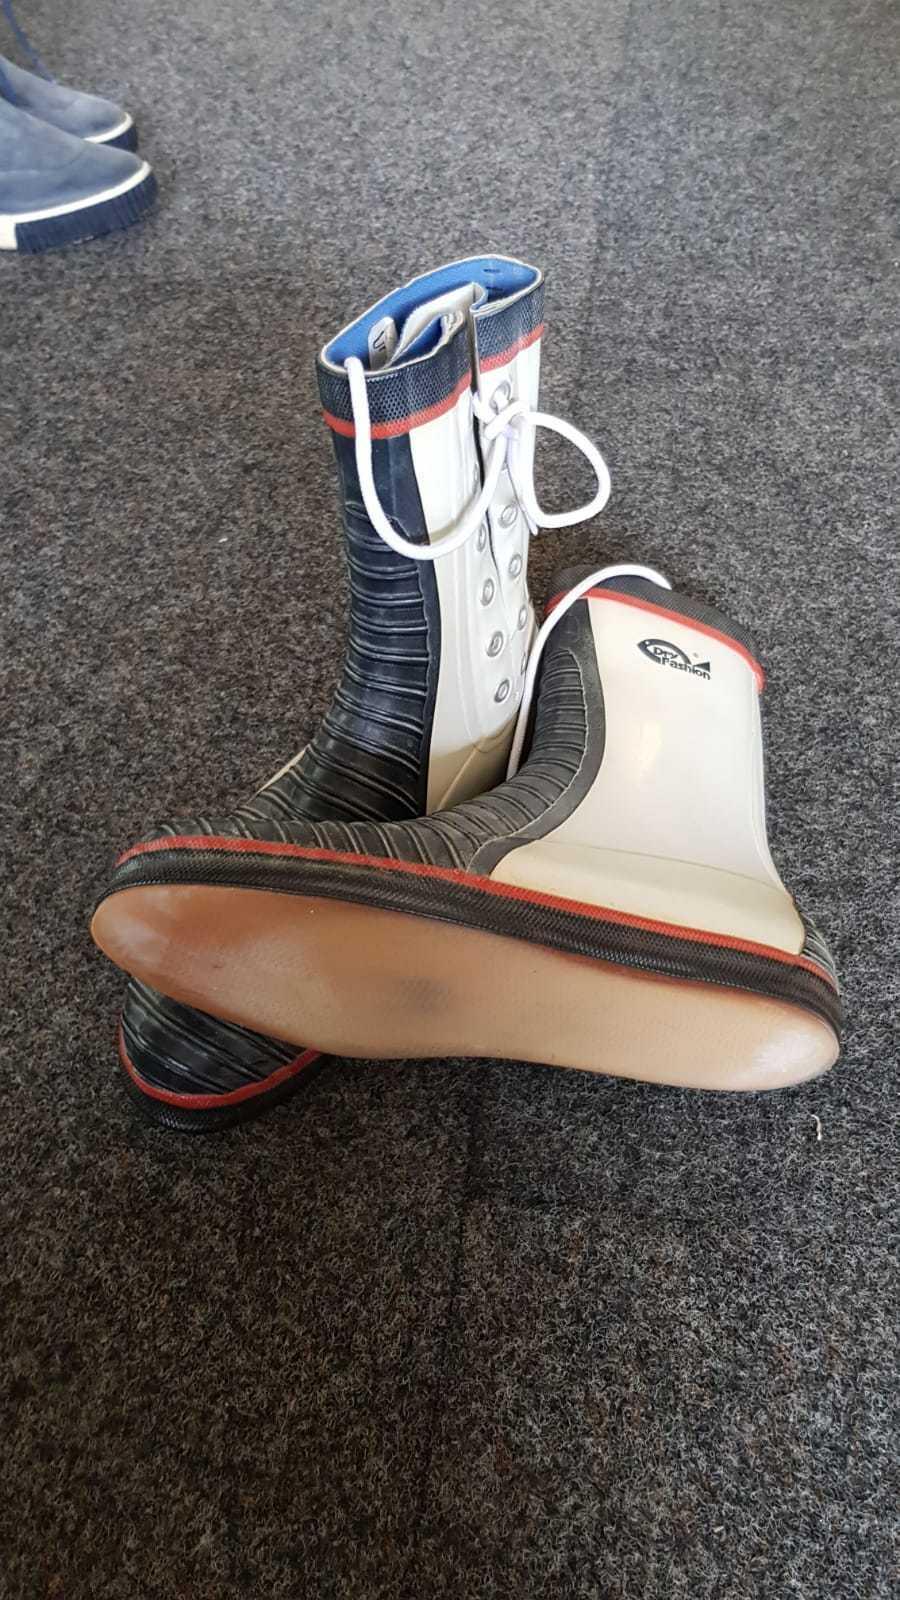 Dry Fashion Trapezstiefel Segeln Stiefel Schuhe Freizeit Stiefel Stiefel Stiefel Gr. 39 oder 41 c683ea